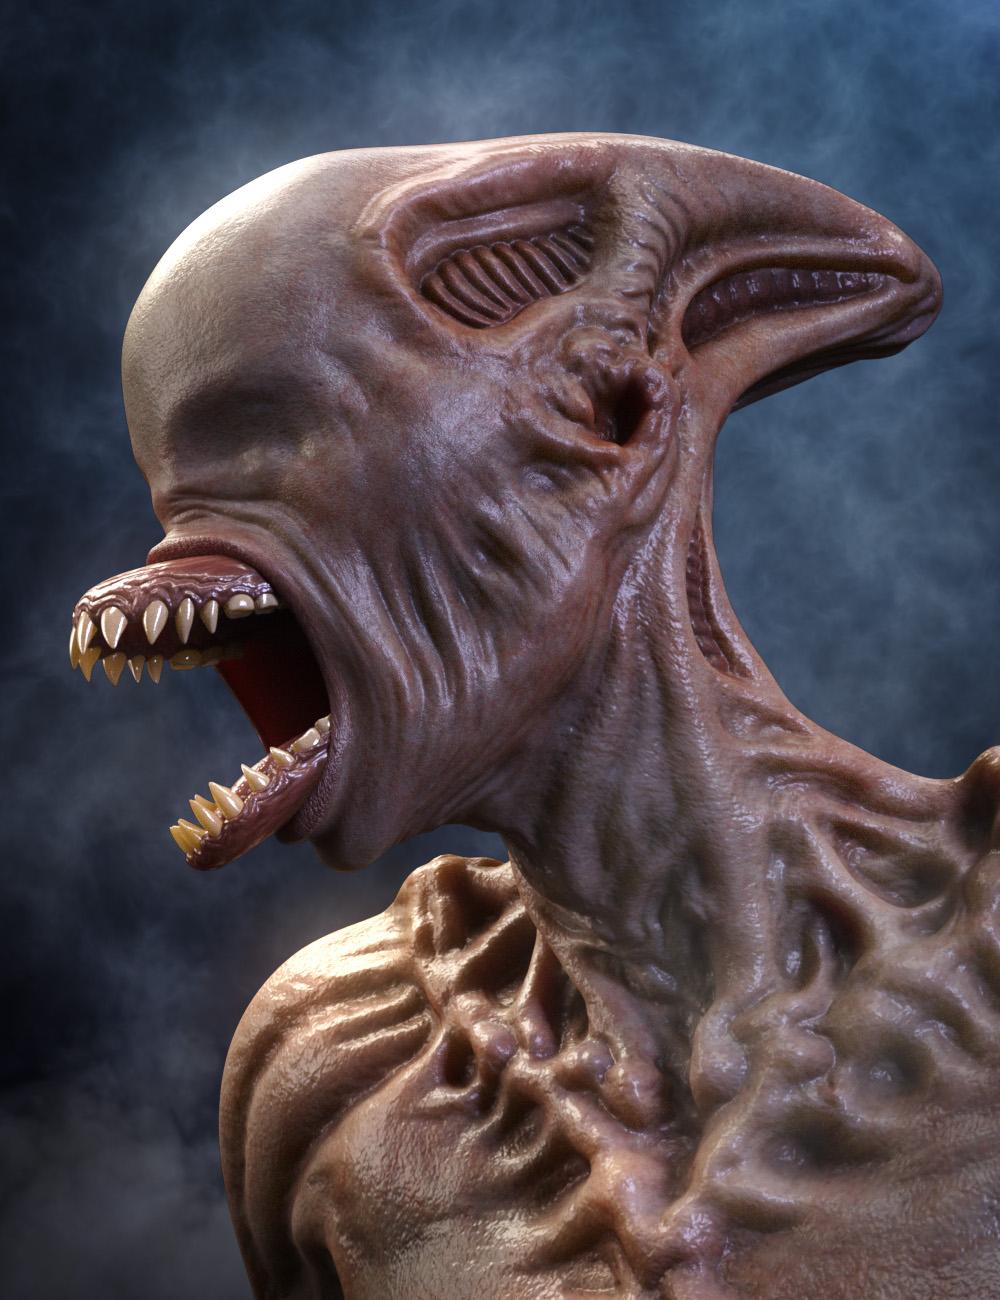 Mutation morphs HD for Genesis 8 Female by: JoLab1985, 3D Models by Daz 3D